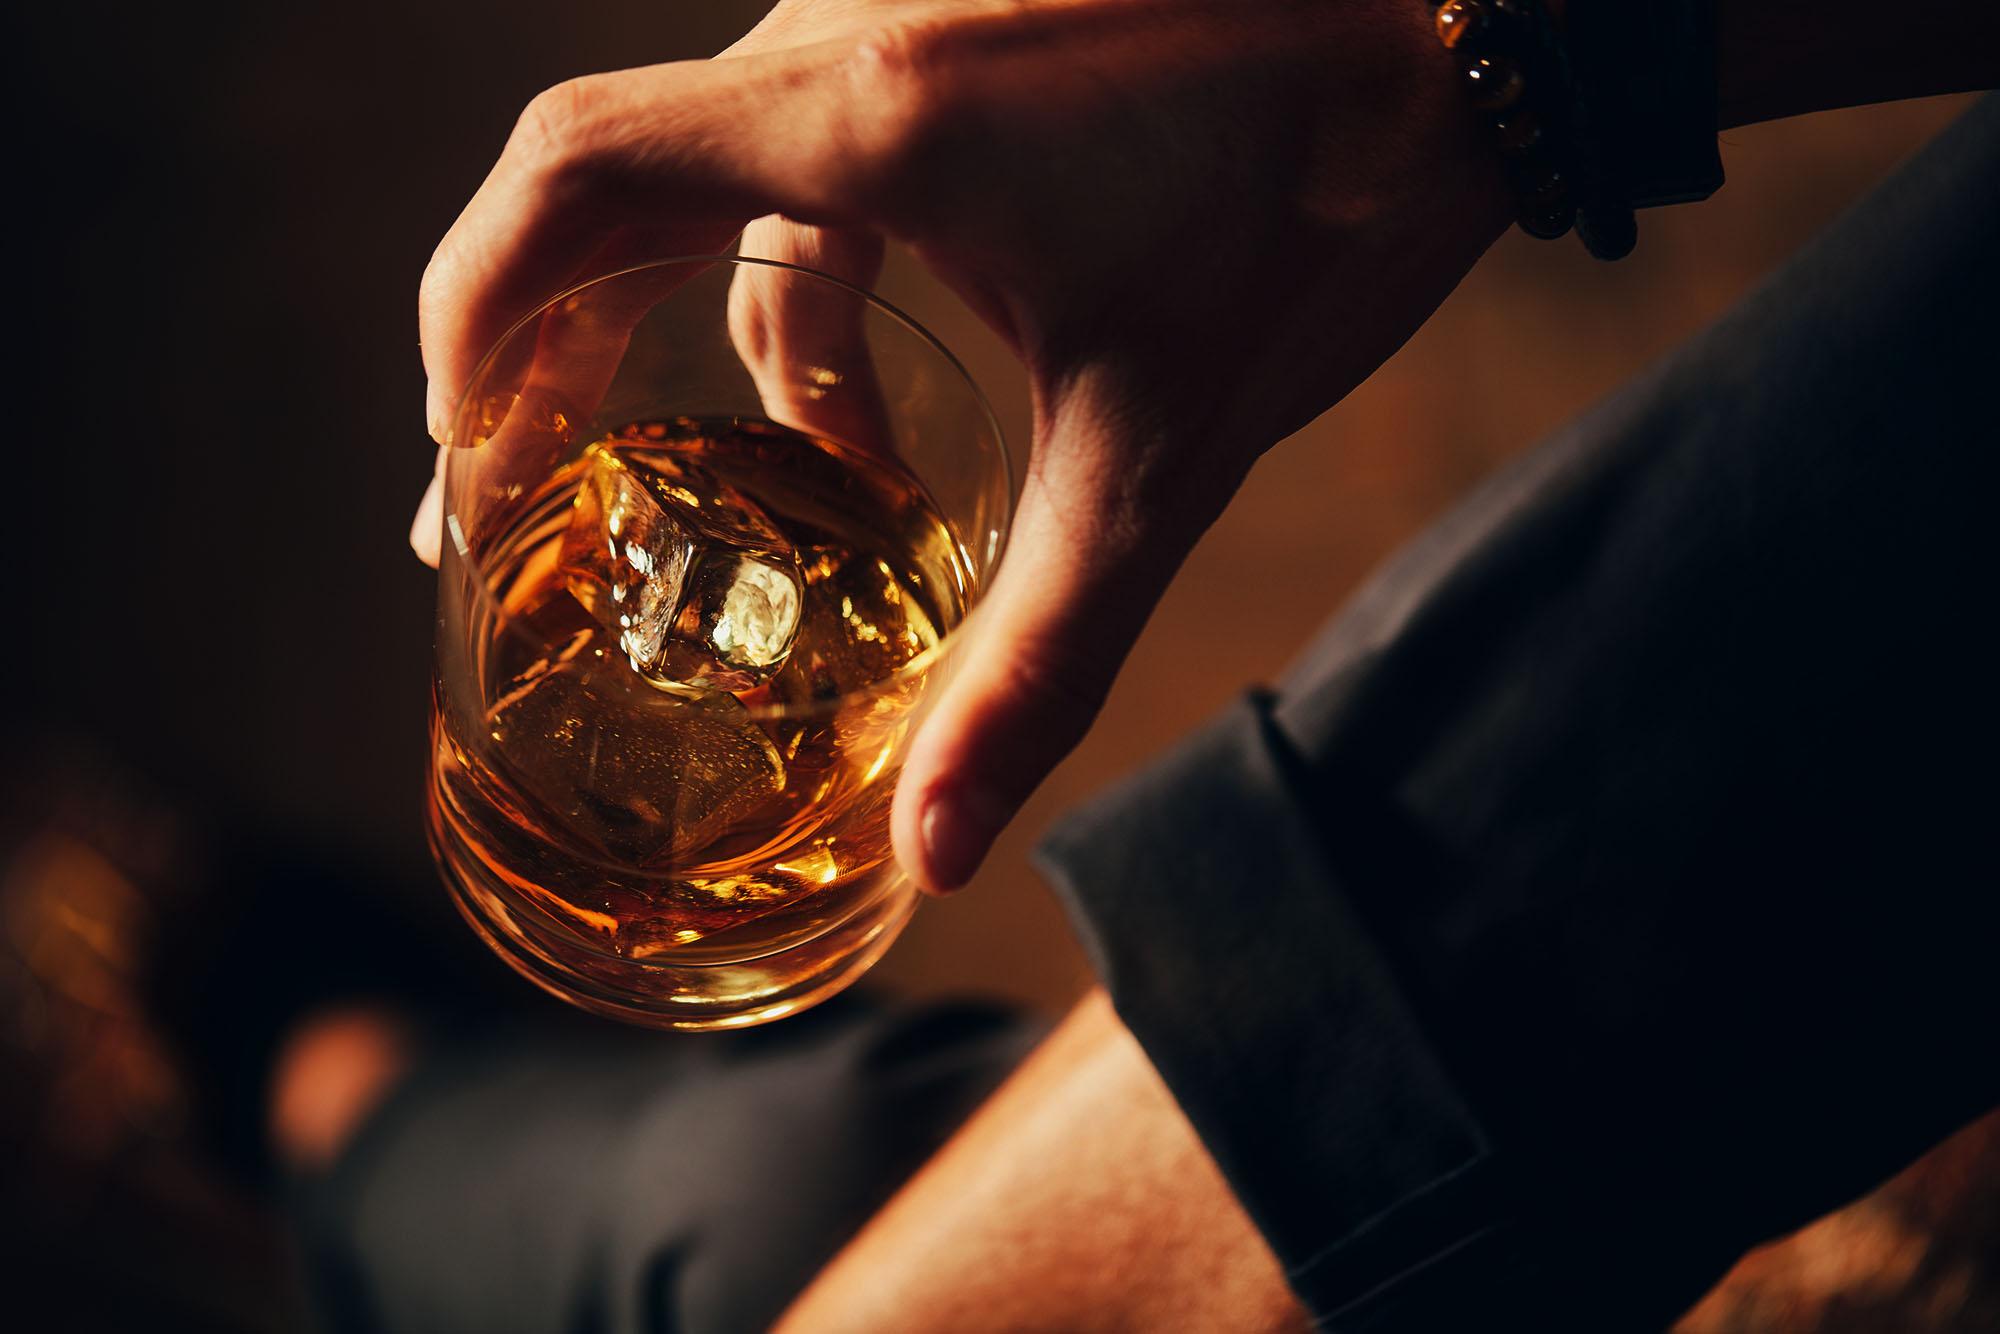 Alcoholism Treatment Programs in Dallas, TX